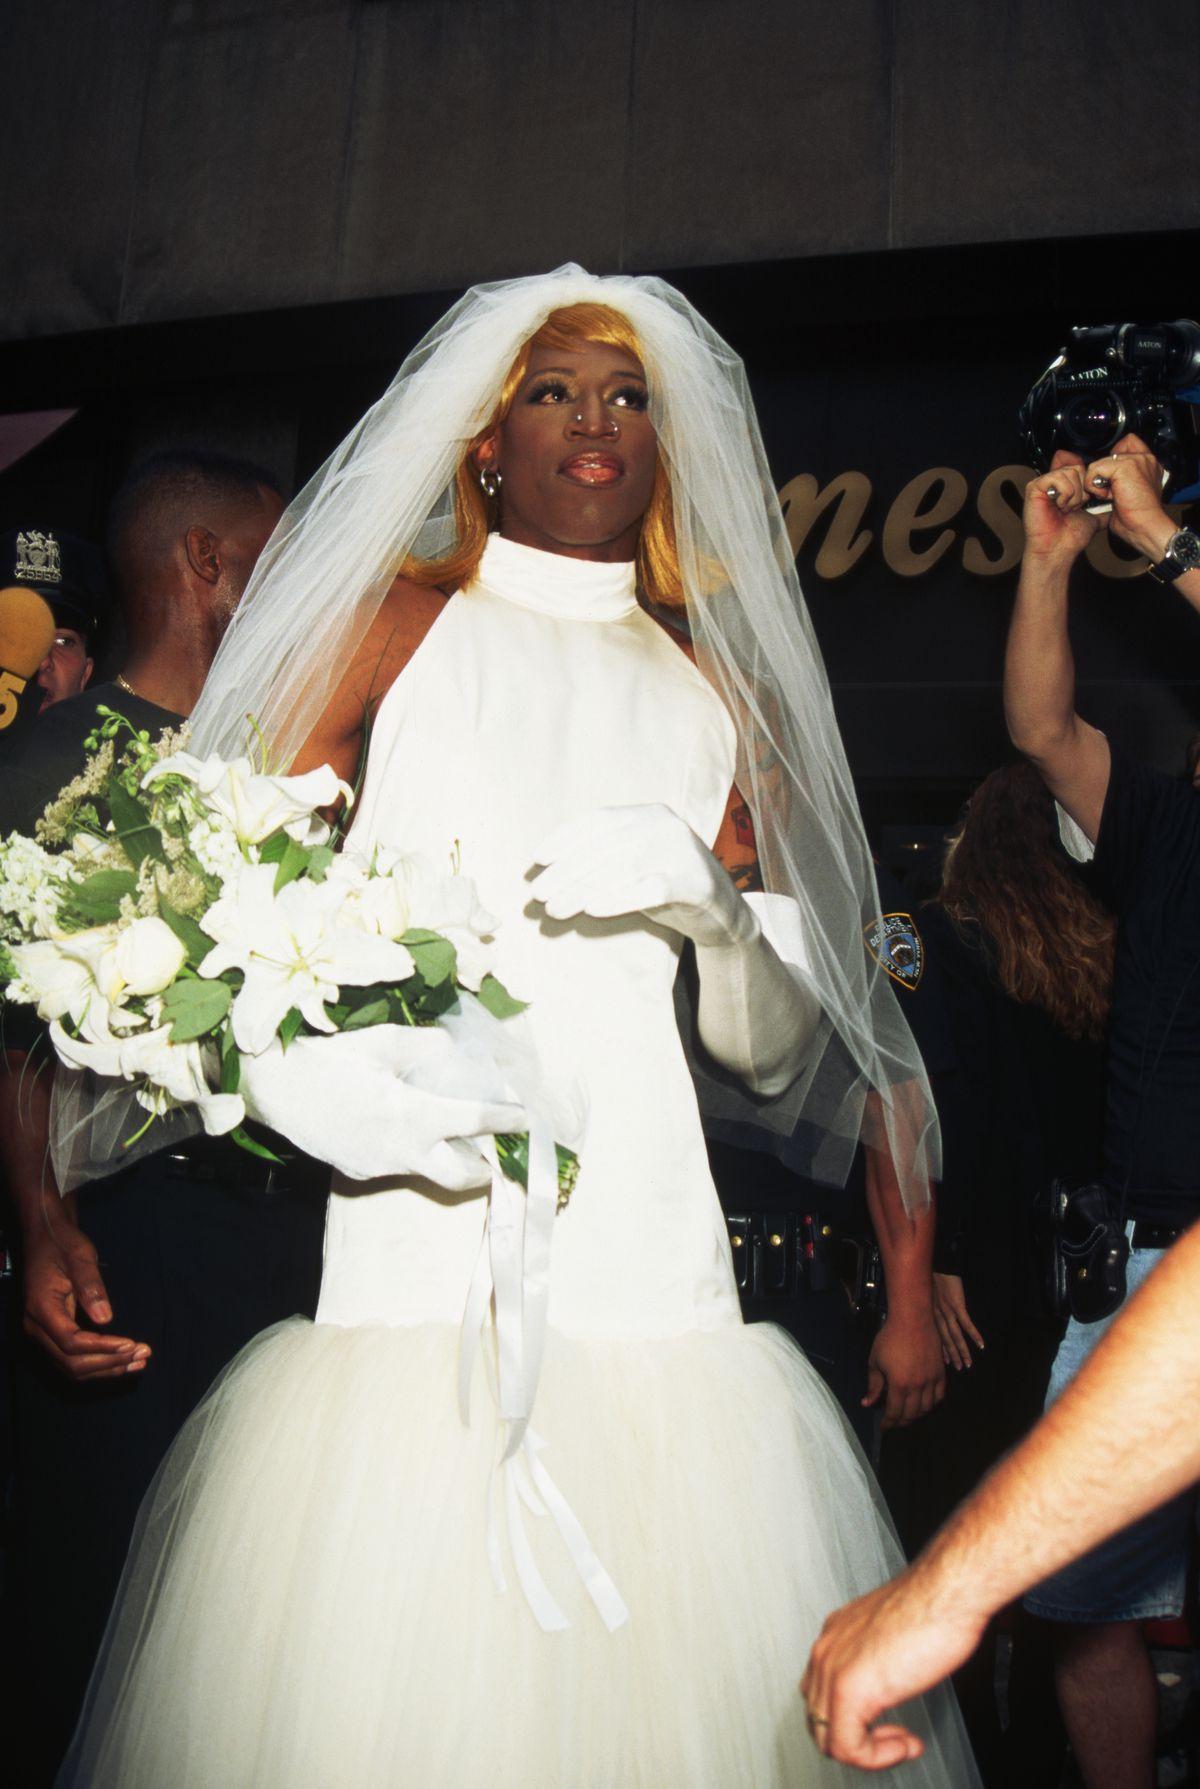 Dennis Rodman Dressed as a Bride